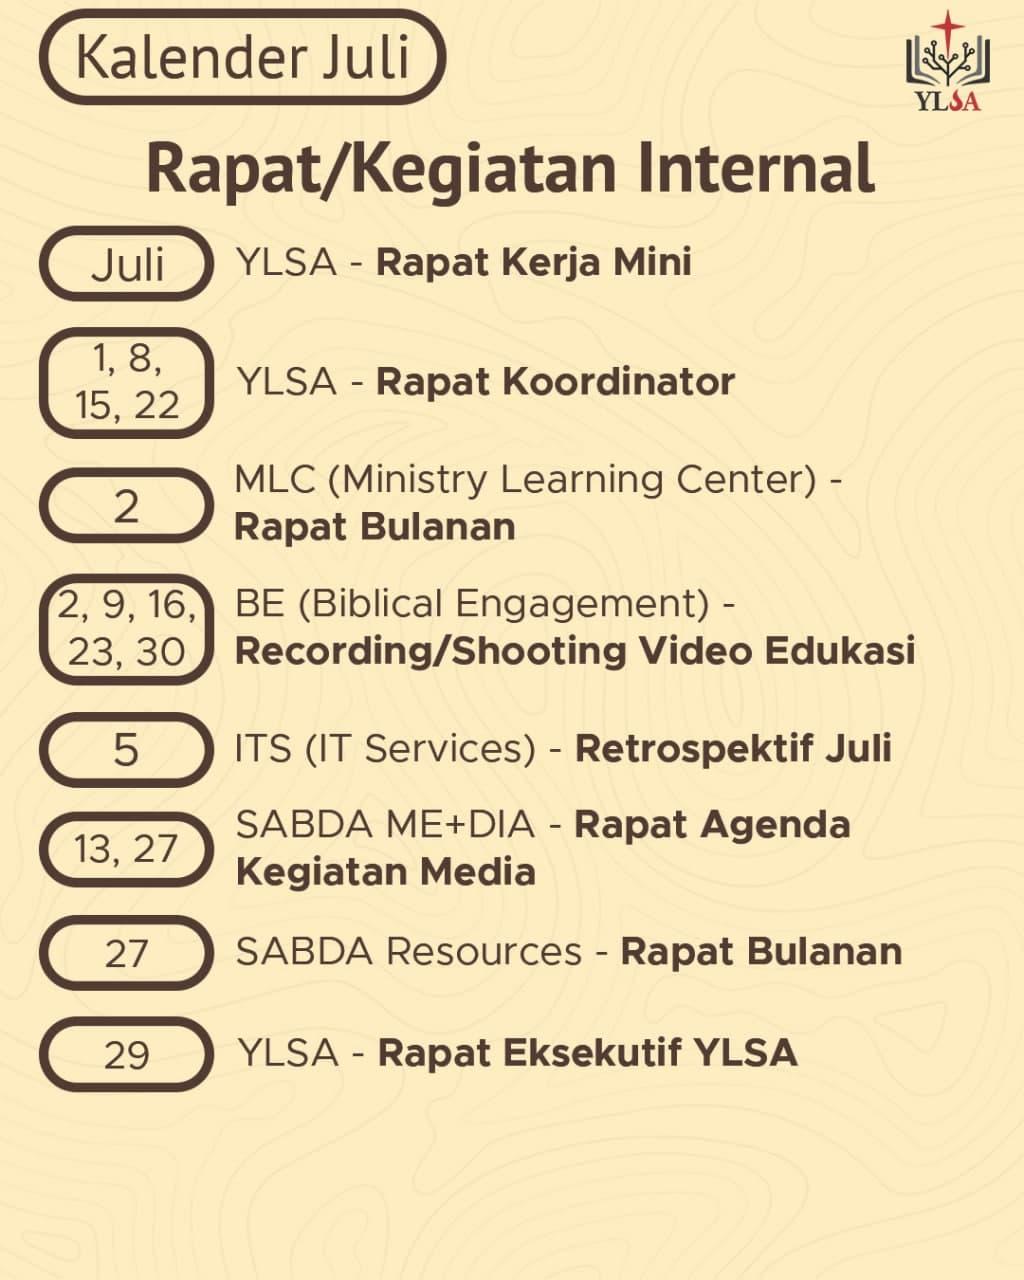 Kalender rapat/kegiatan internal YLSA selama Juli 2021.